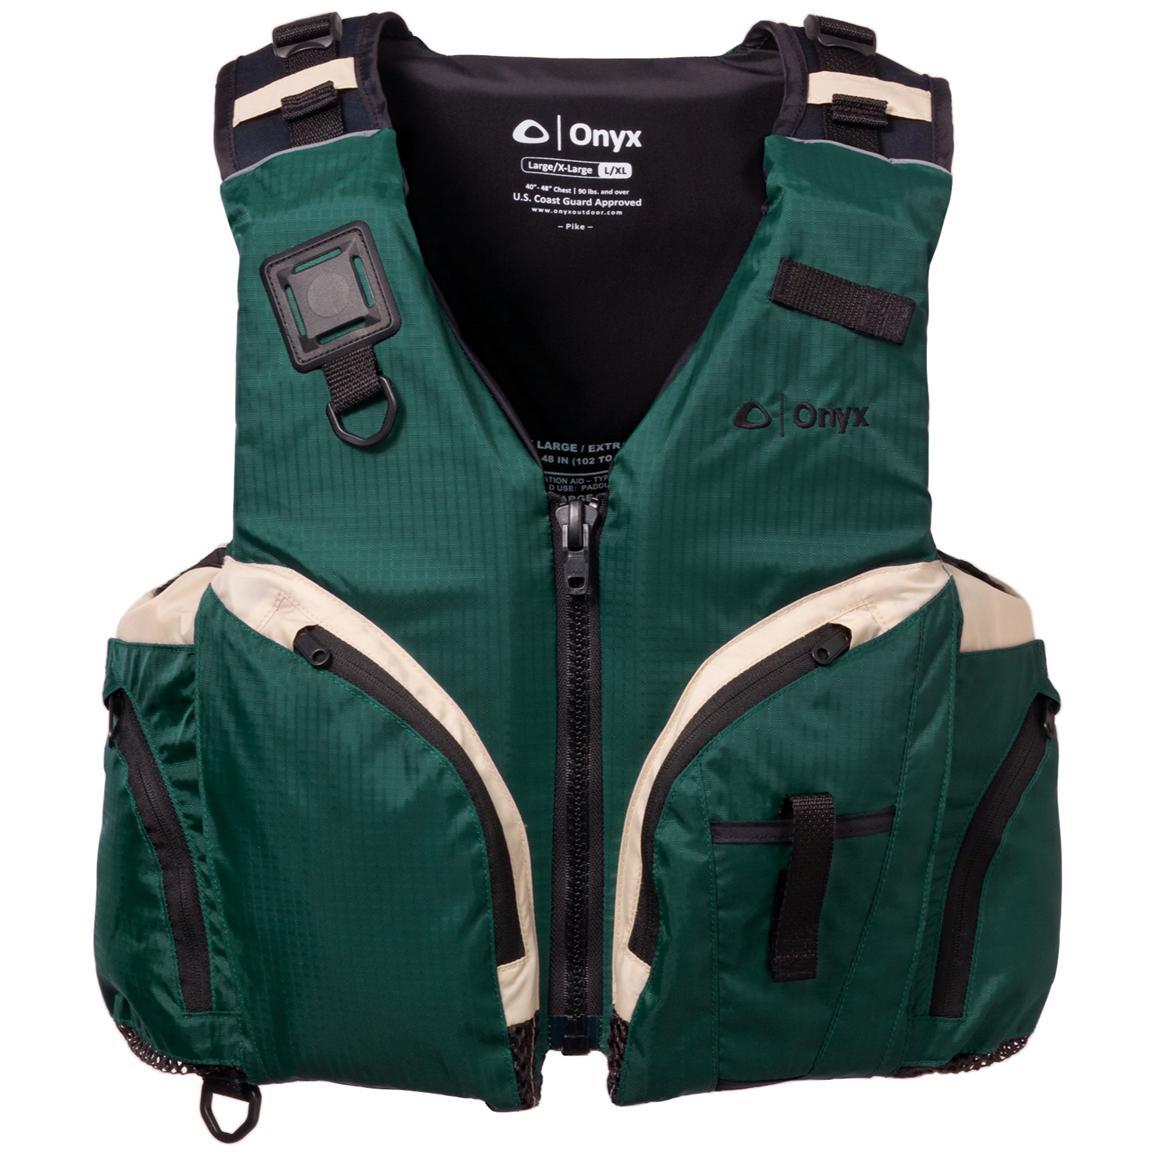 Onyx® Pike Paddle Sports / Kayak Fishing Life Vest ...